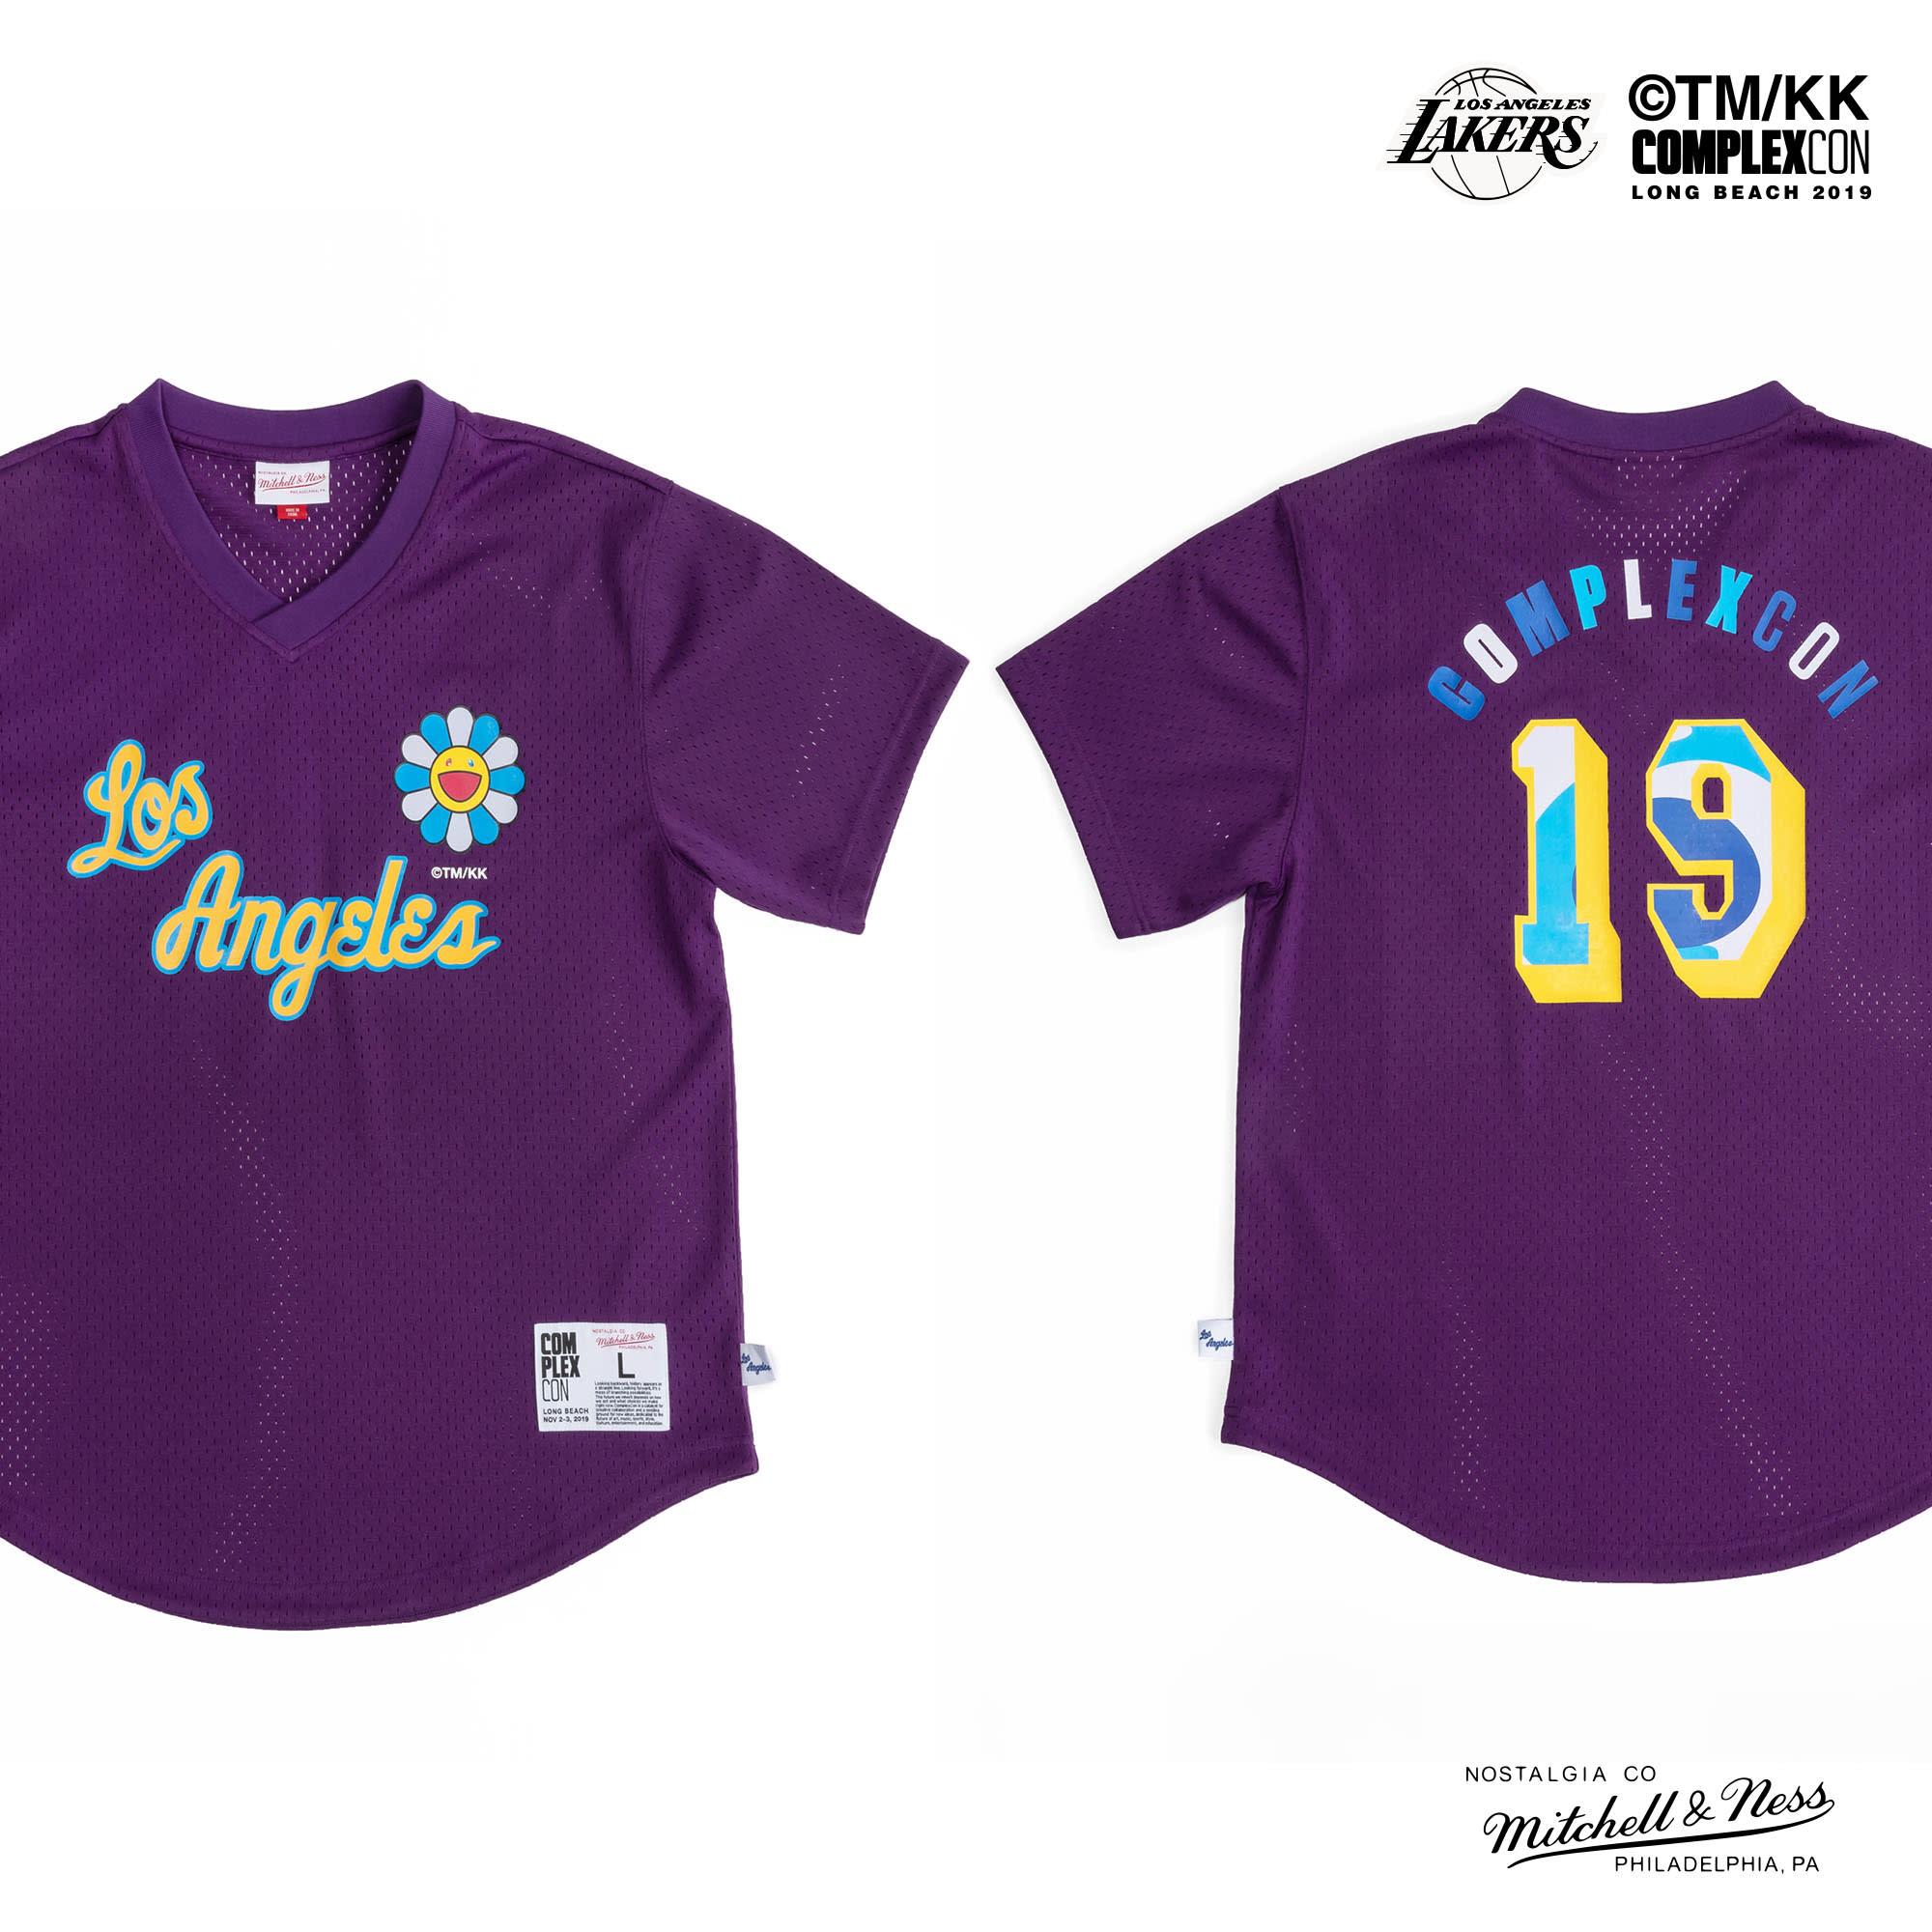 Complexcon Lakers Jersey Takashi Murukami